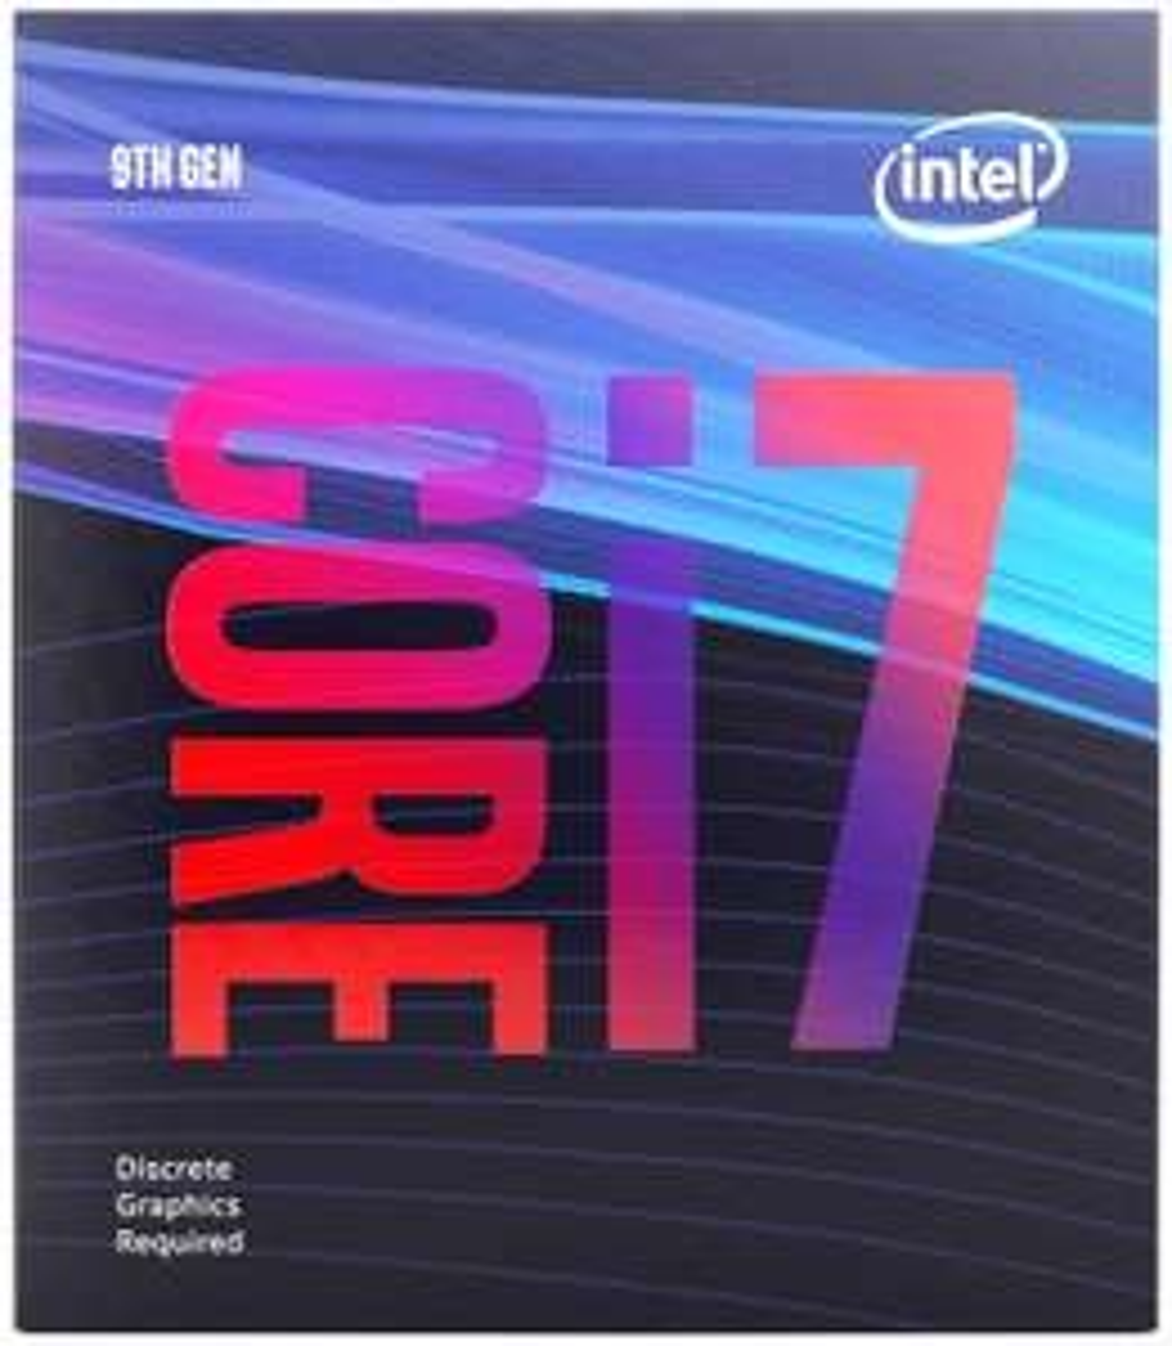 Processeur Intel i7 9700F - 3.0 GHz, Mode Turbo à 4.7 GHz